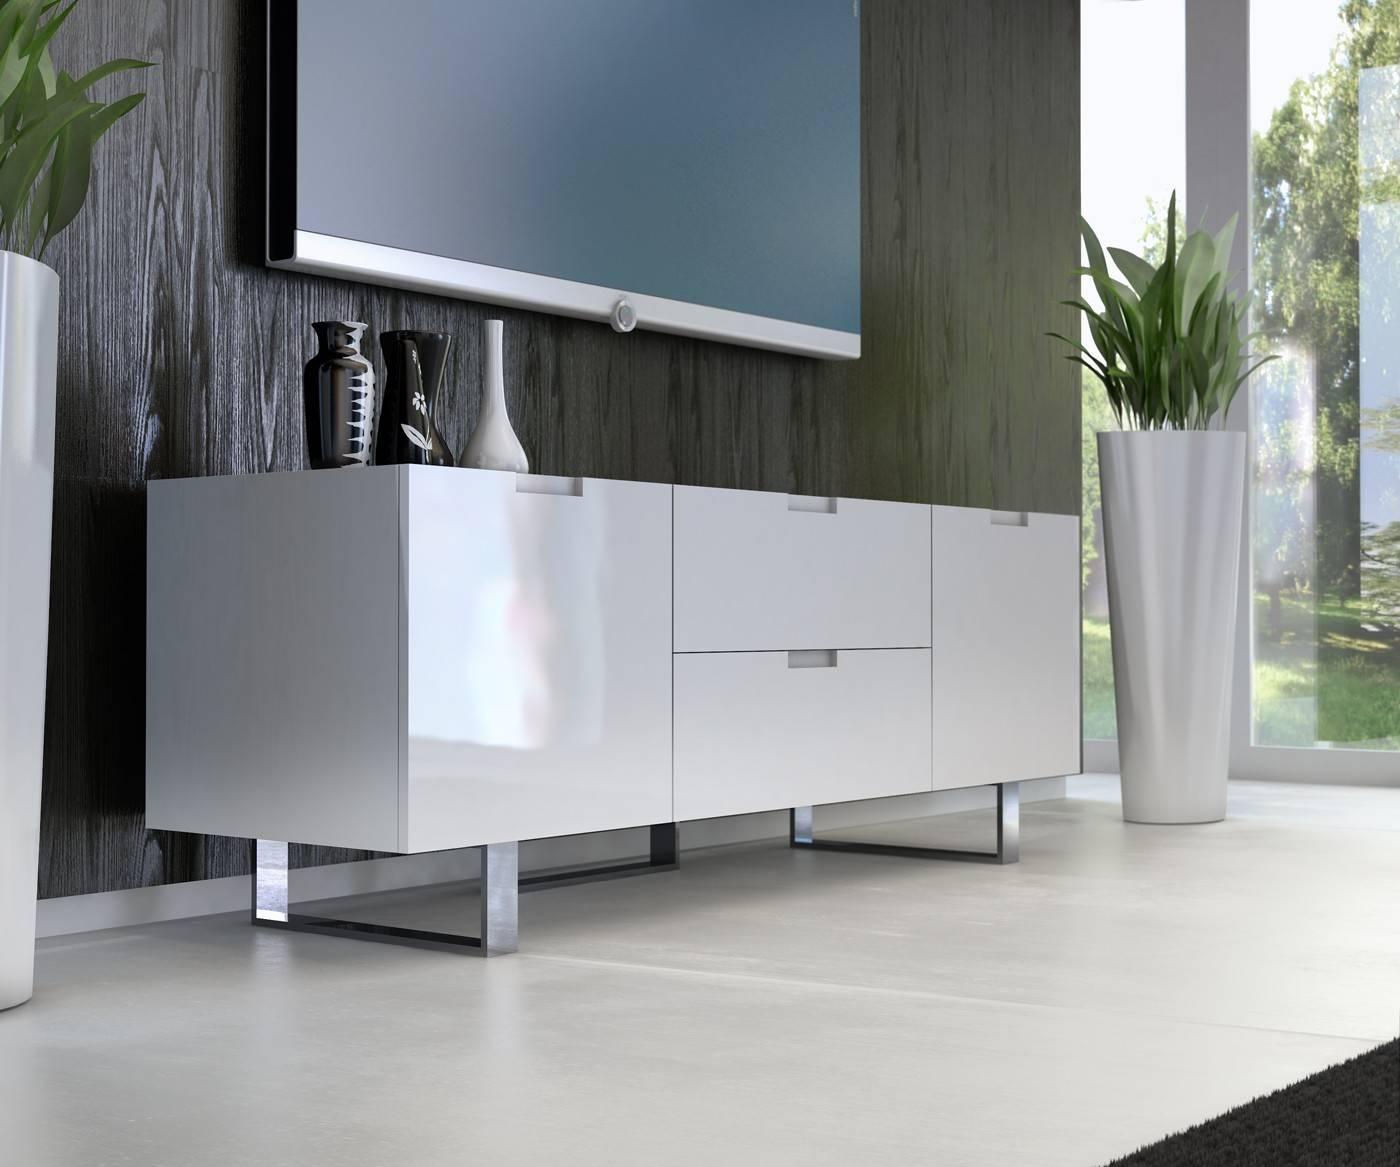 Eldridge Tv Standmodloft Buy From Nova Interiors Contemporary regarding Modern White Lacquer Tv Stands (Image 5 of 15)